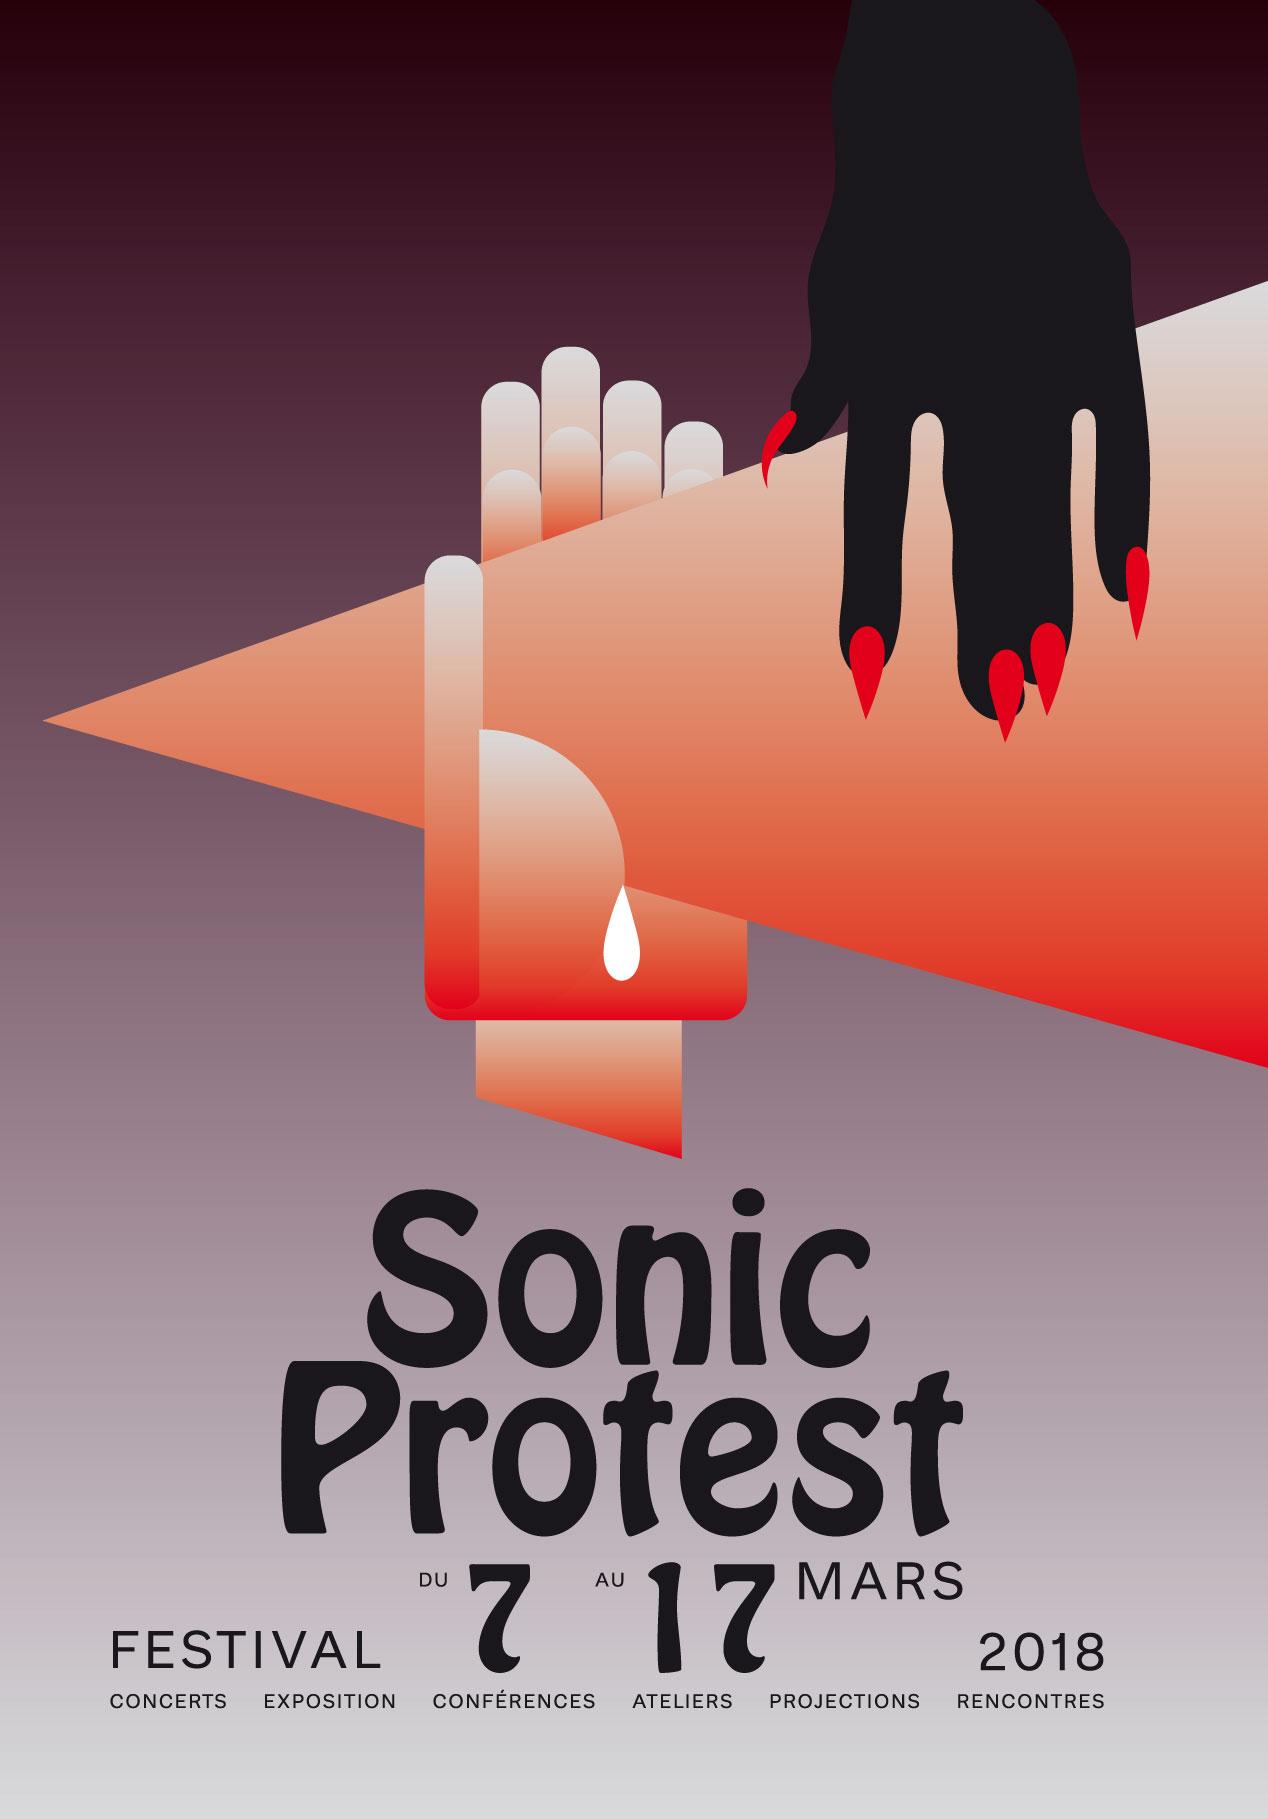 ensapc-sonic-protest-2